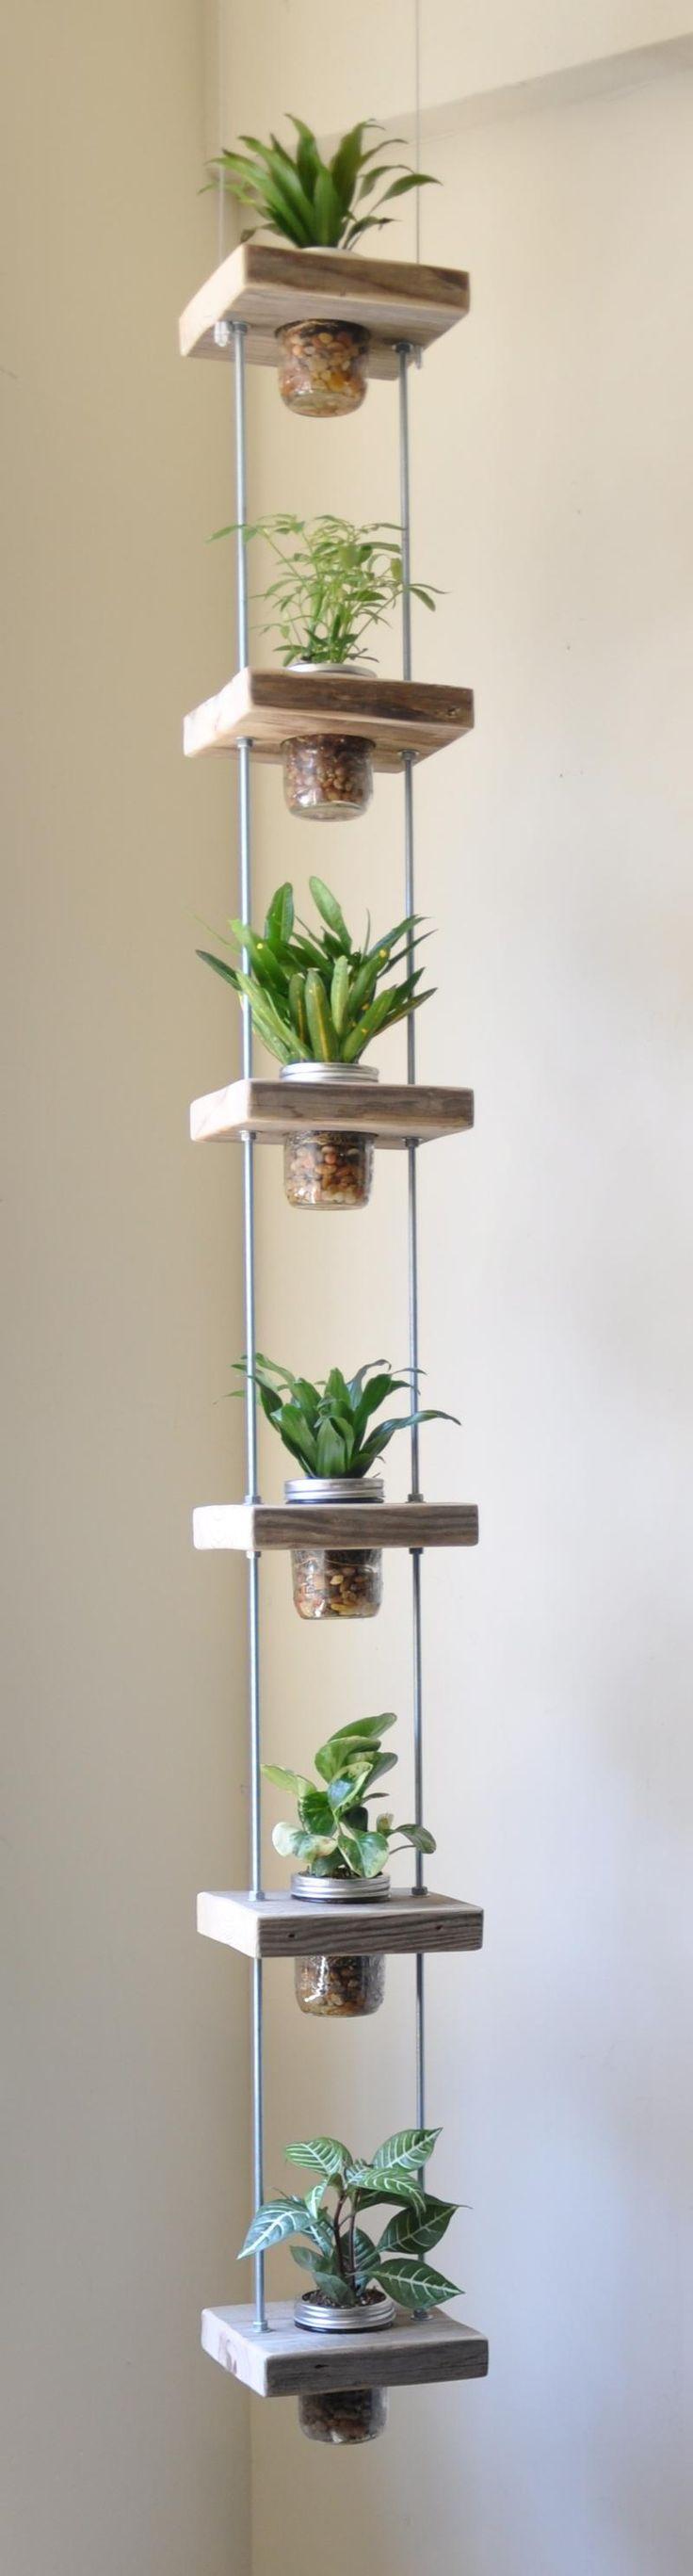 34-beautiful-hanging-garden-ideas-20